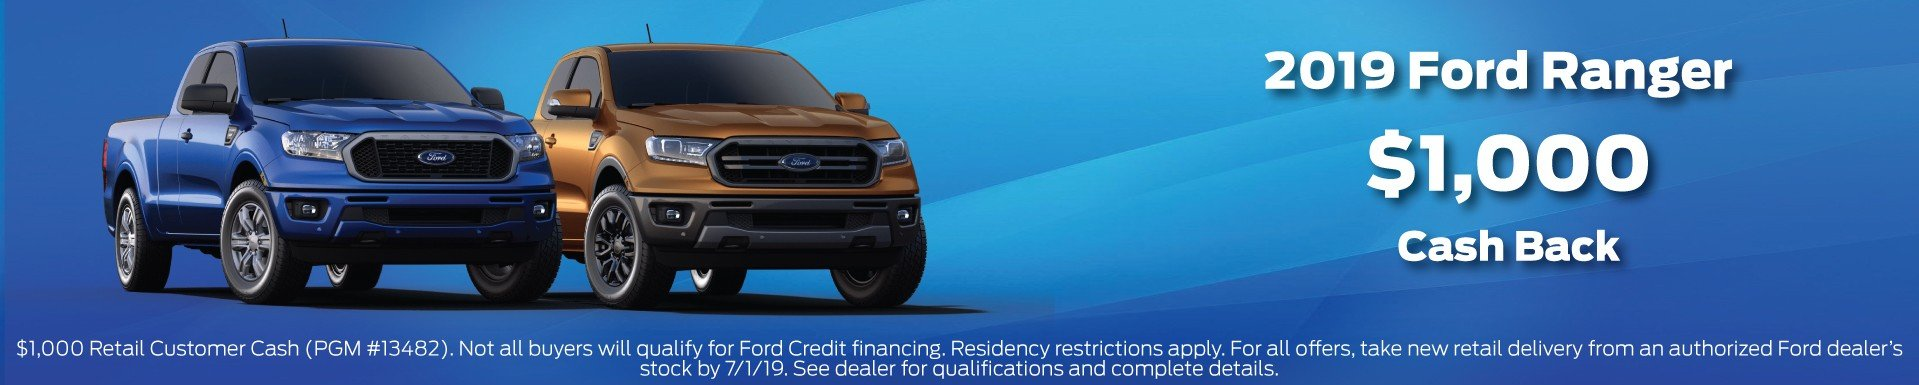 2019 Ranger Incentive 7-1-2019